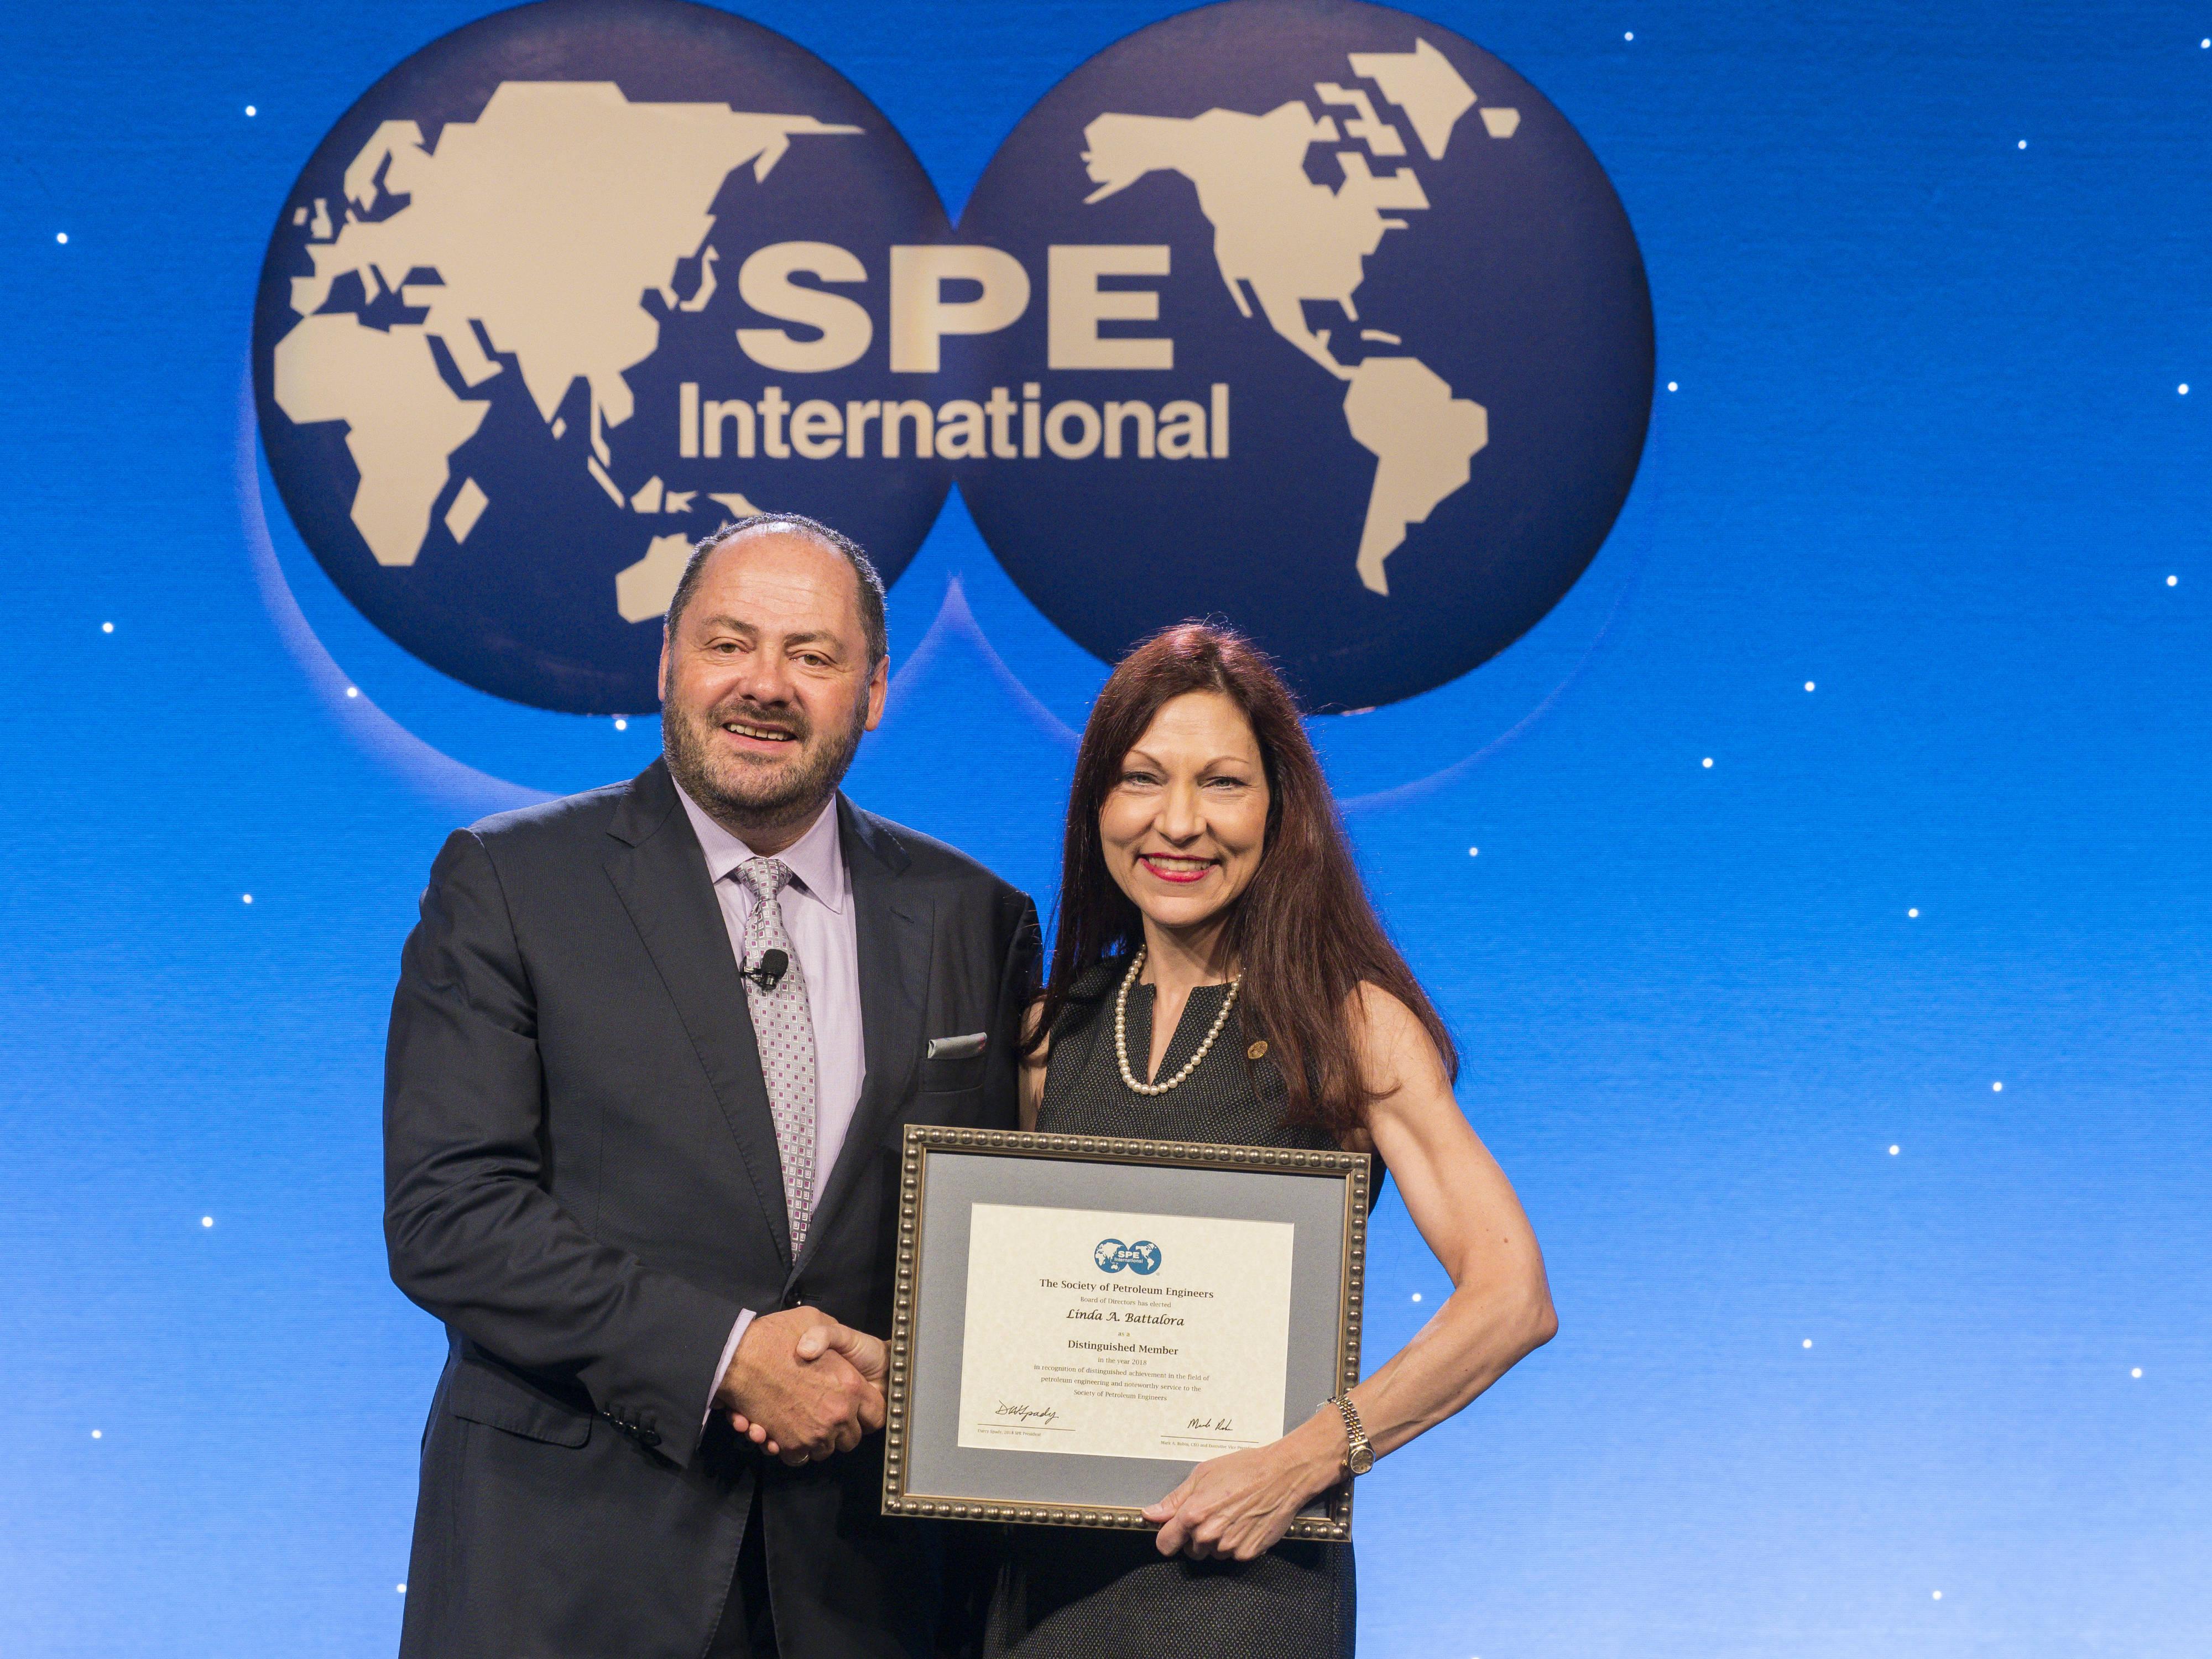 Mines Professor Linda Battalora accepting her SPE Distinguished Membership